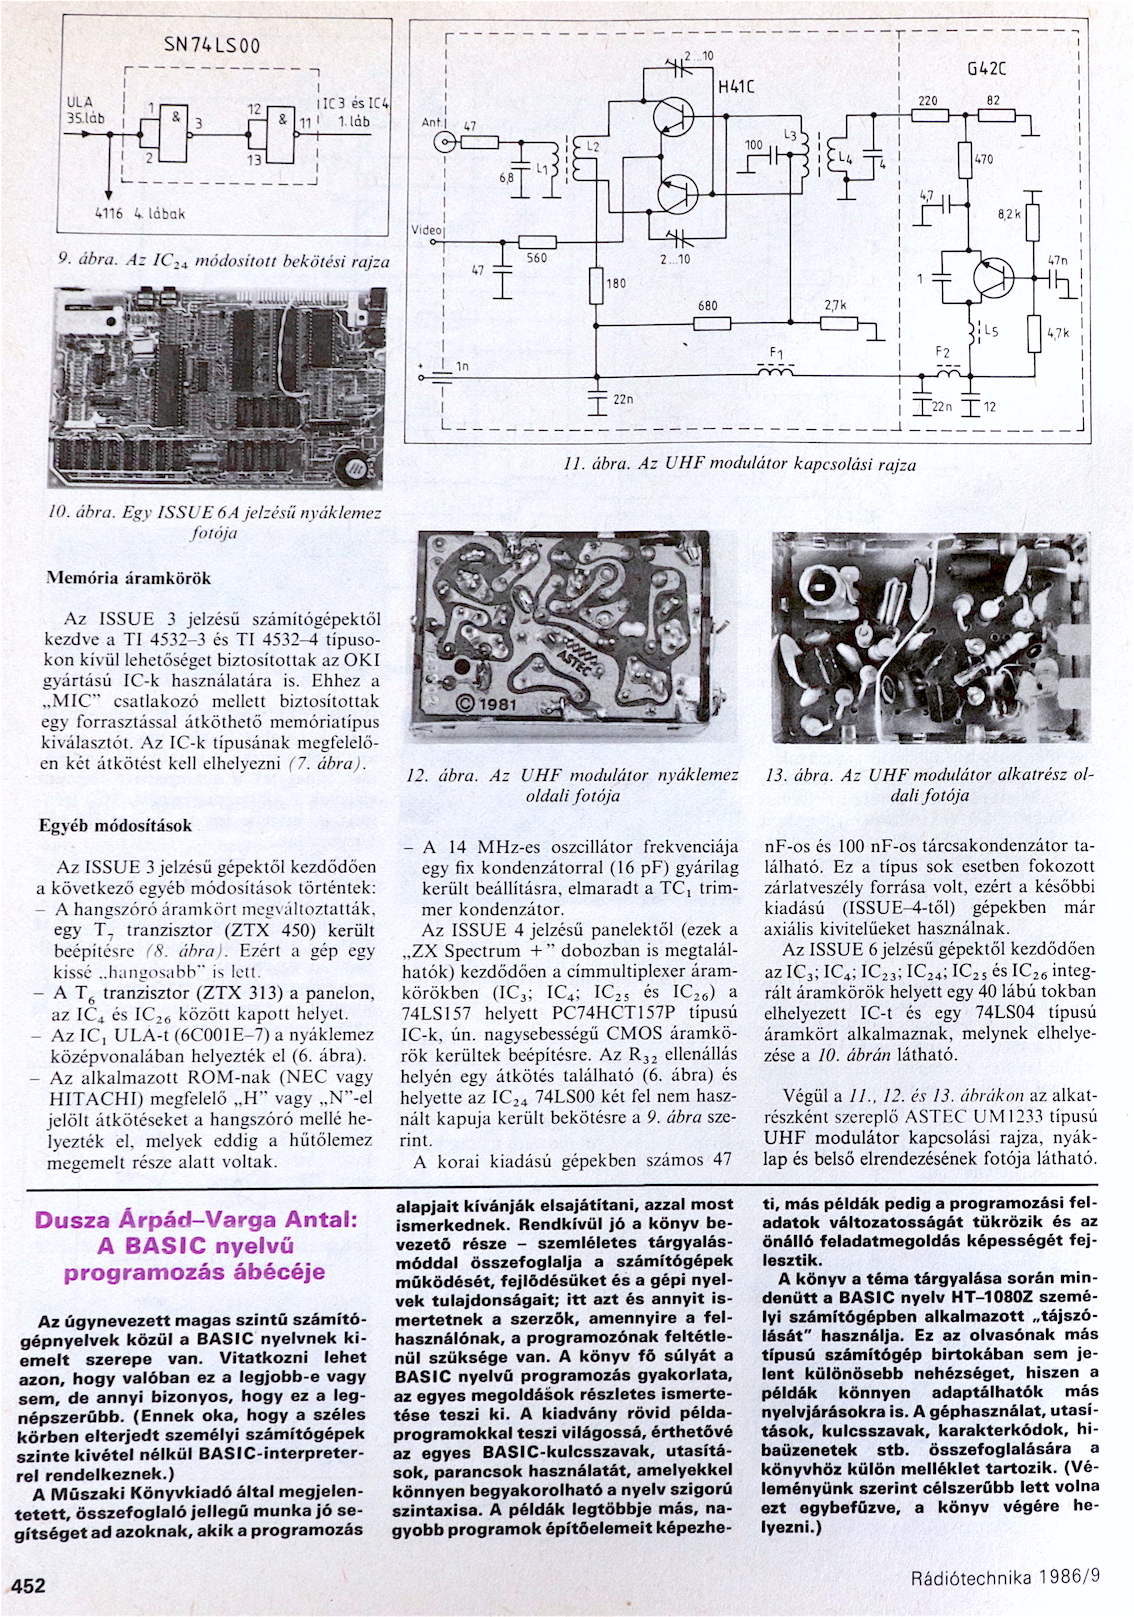 Rádiótechnika Spectrum+ 3. oldal